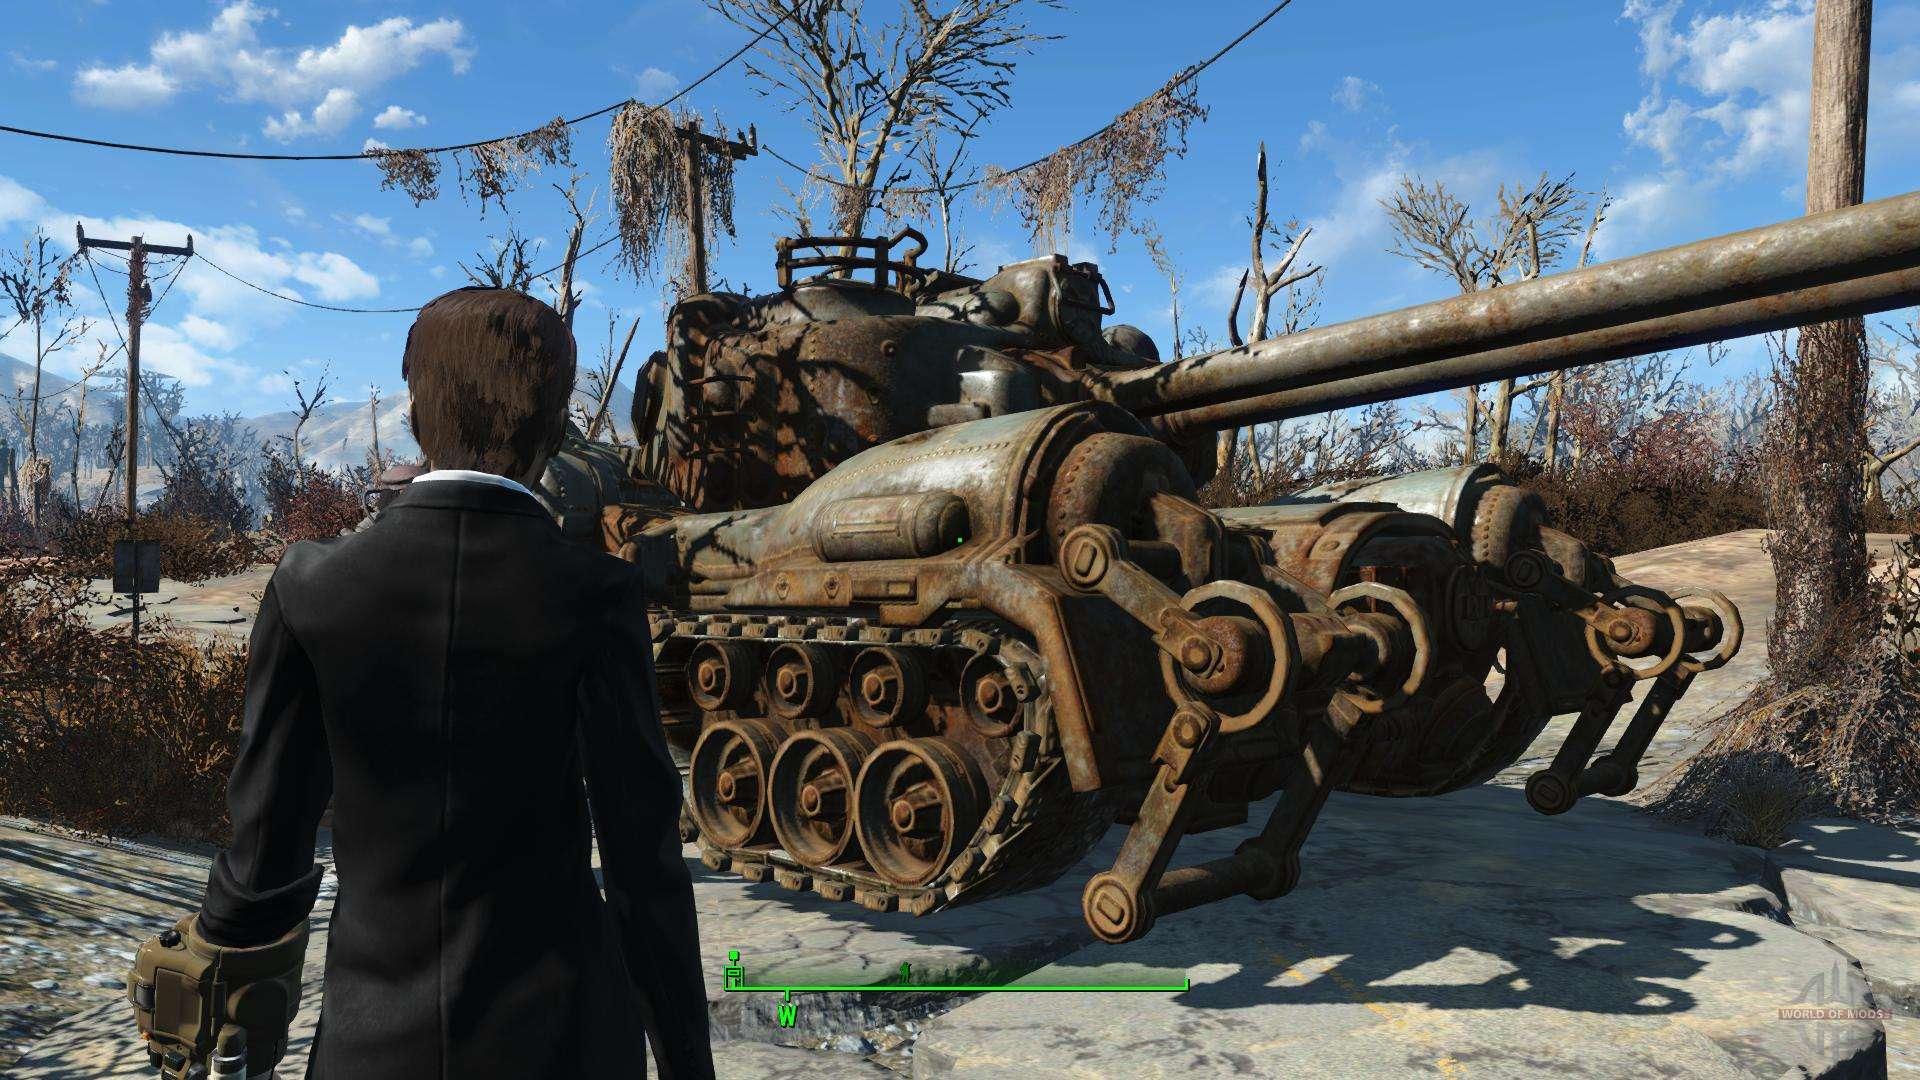 Asi Loader Fallout 4 Settlements - etcfasr